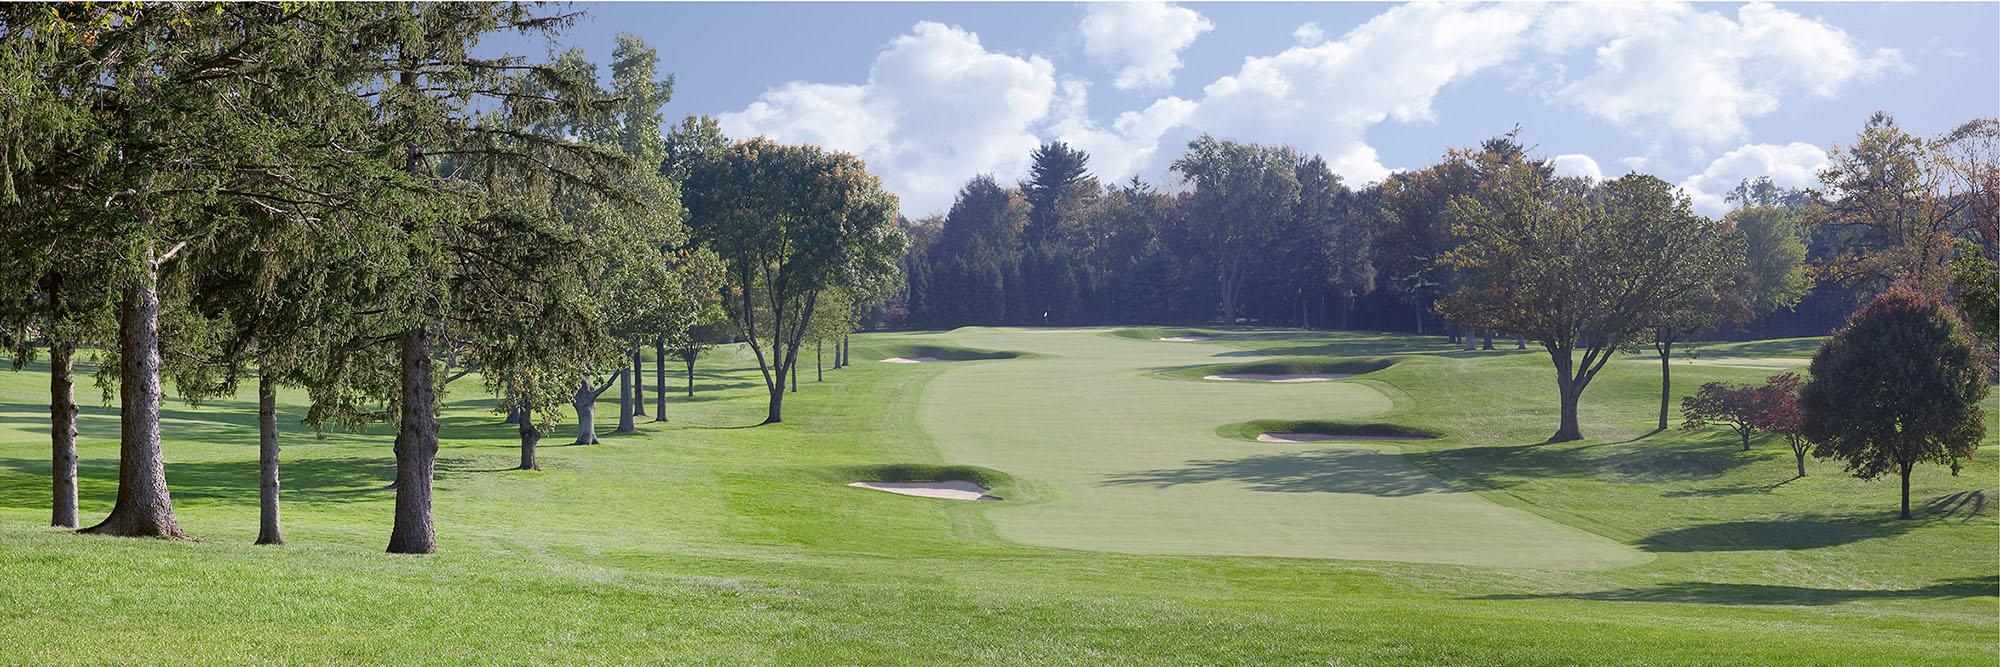 Golf Course Image - Aronimink No. 12